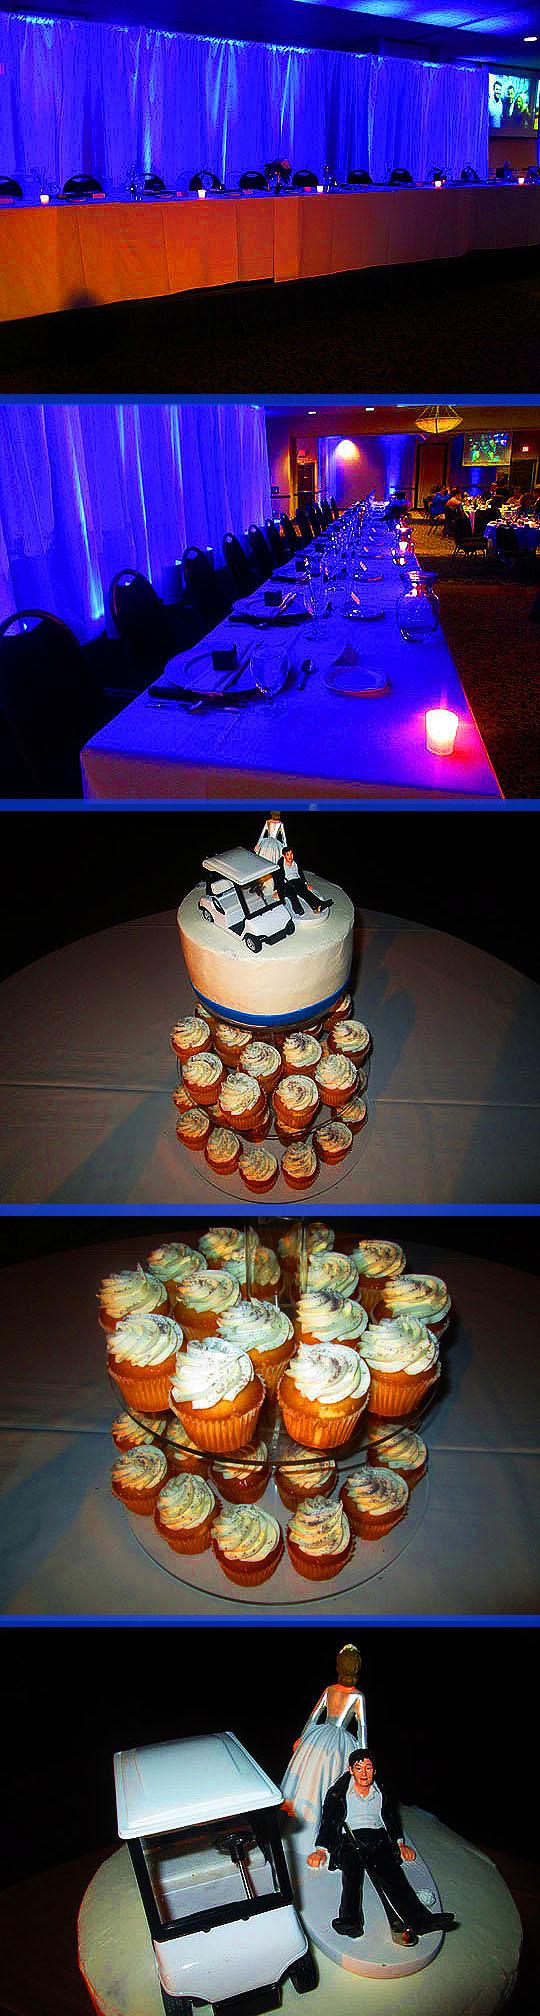 10. weddingcake_july30-18.jpg